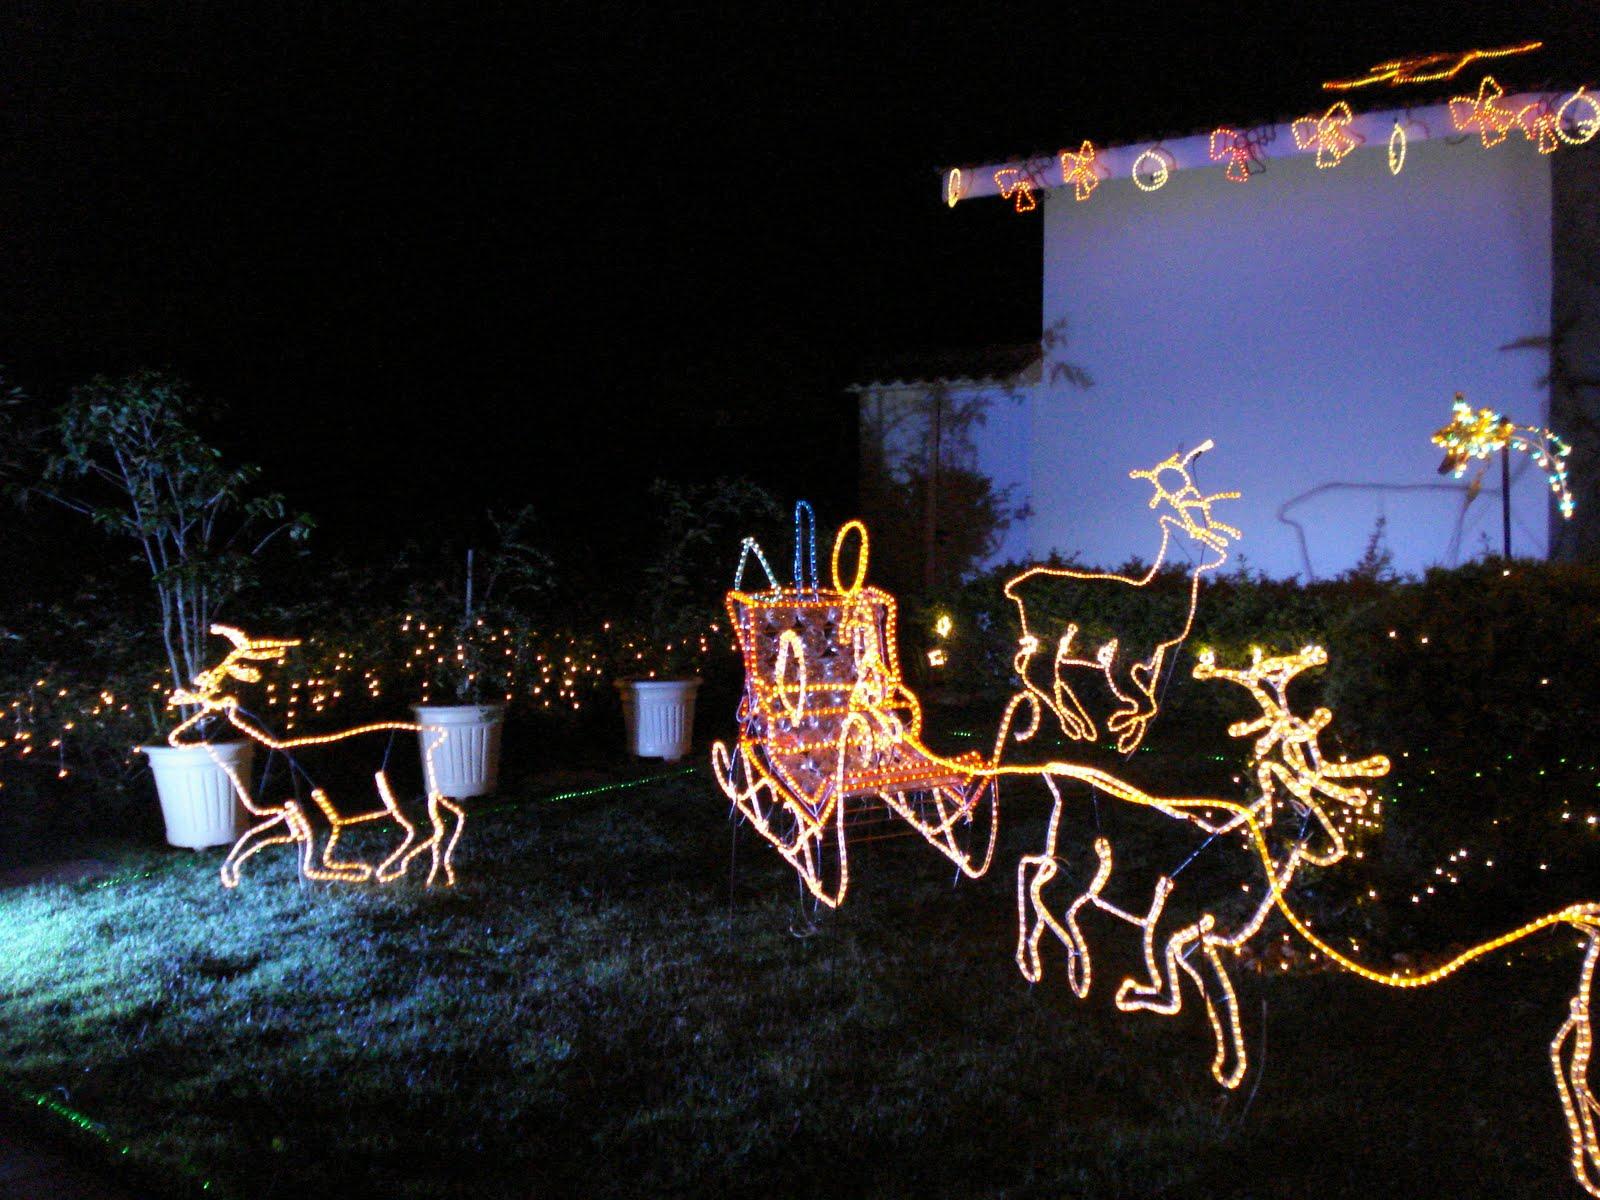 enfeites luminosos de natal para jardim : enfeites luminosos de natal para jardim:Cópia+de+Enfeites+de+natal+2008+096.jpg